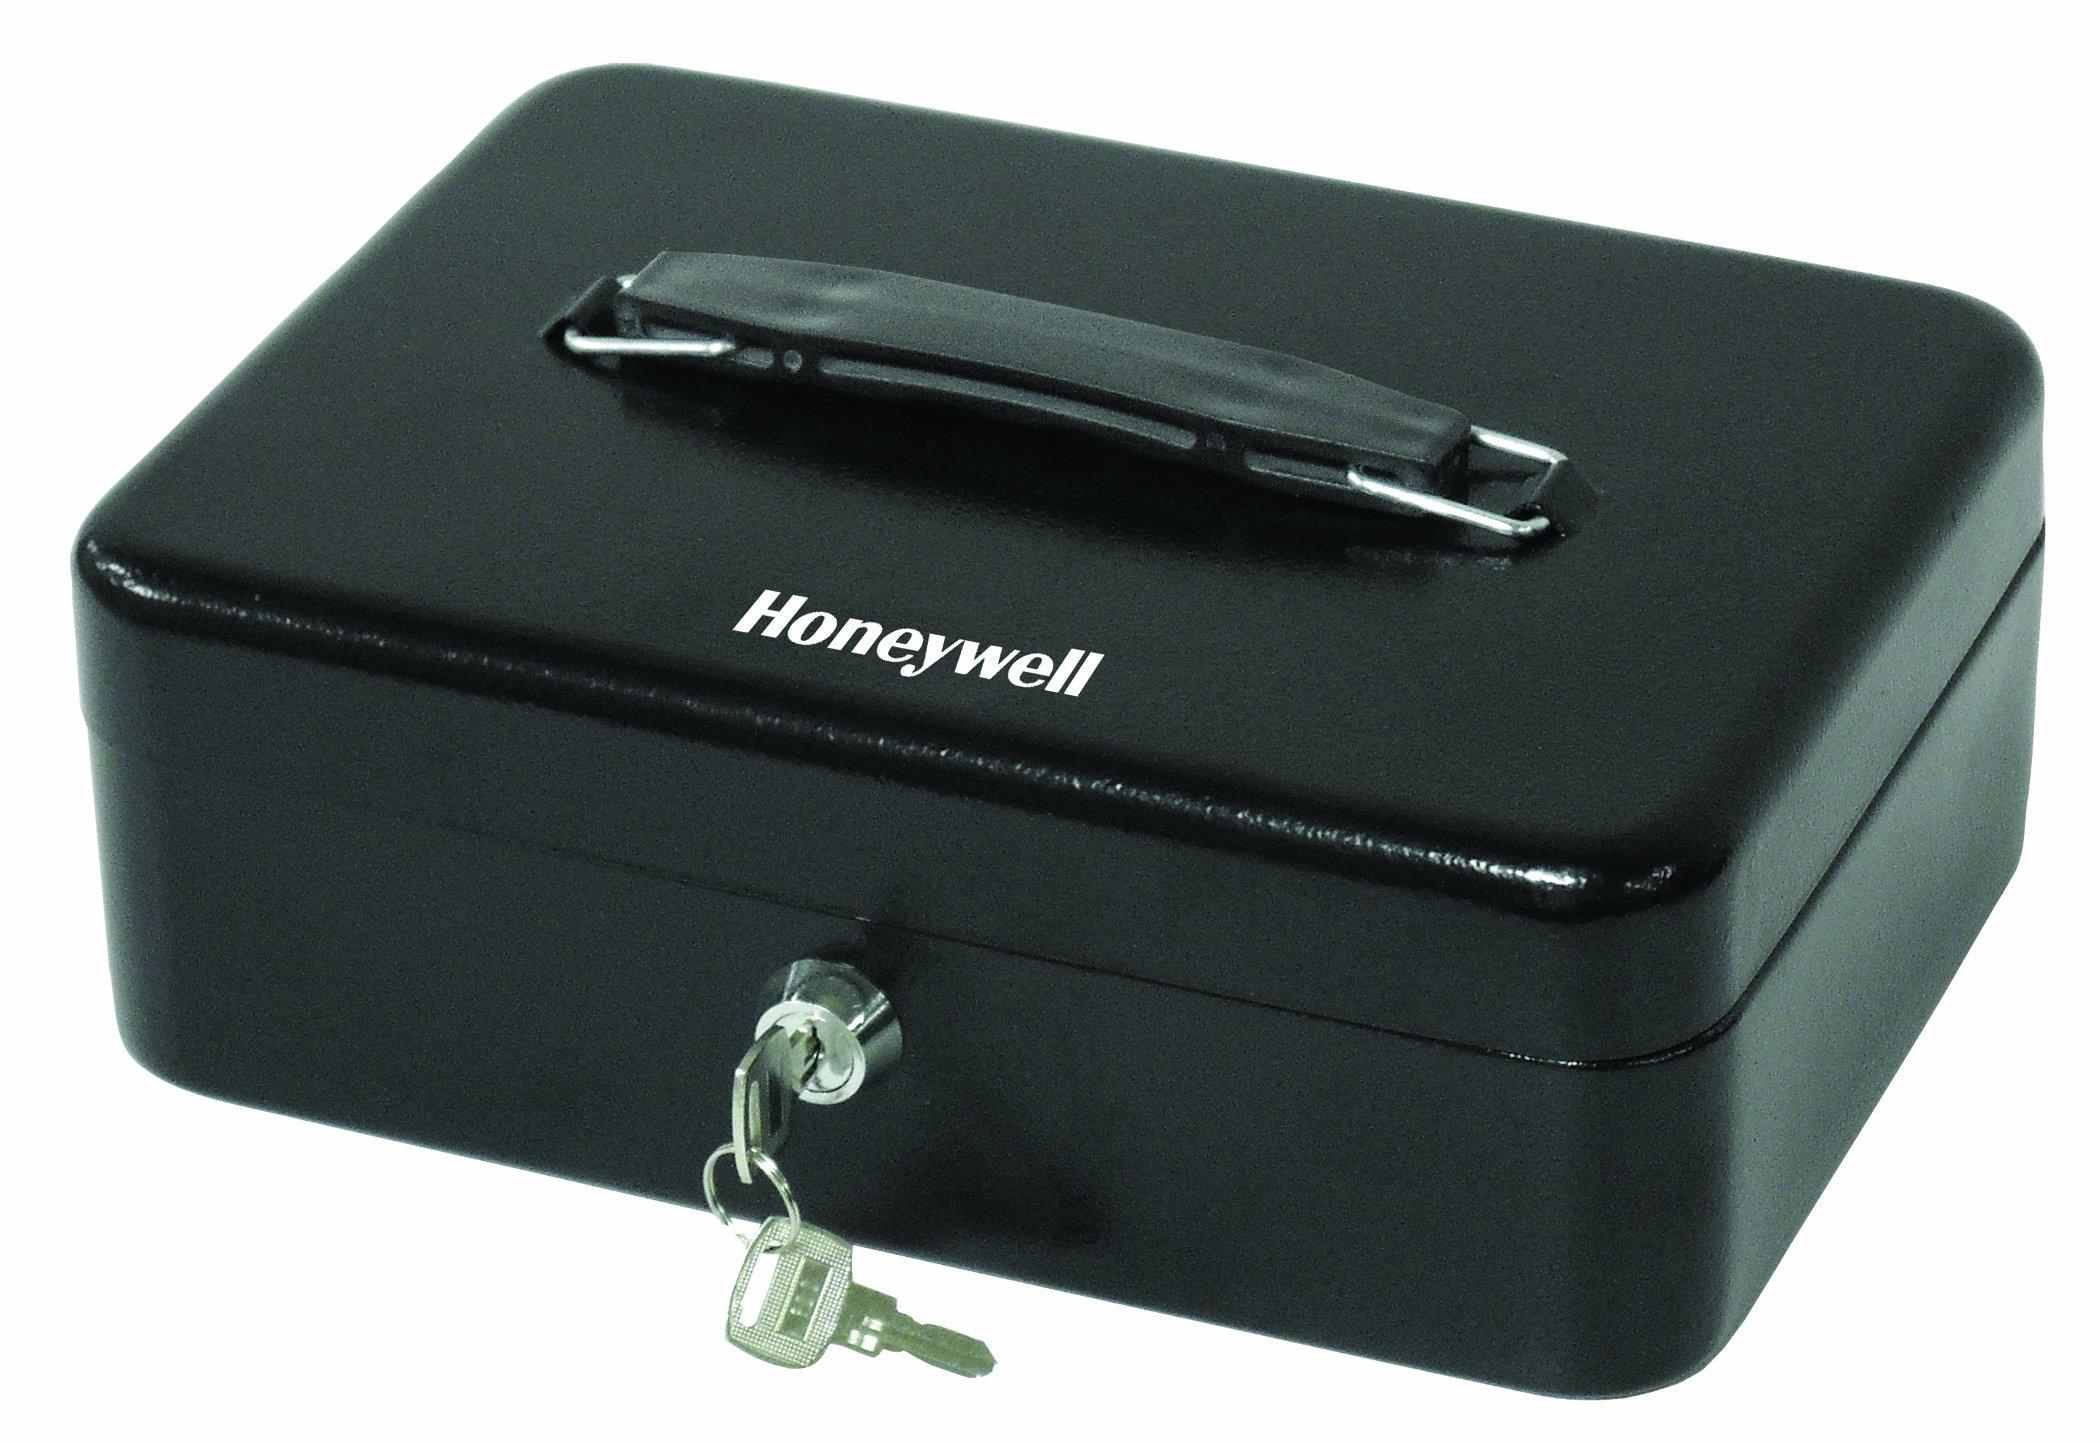 HONEYWELL - 6112 Standard Steel Cash Box with Key Lock, Black